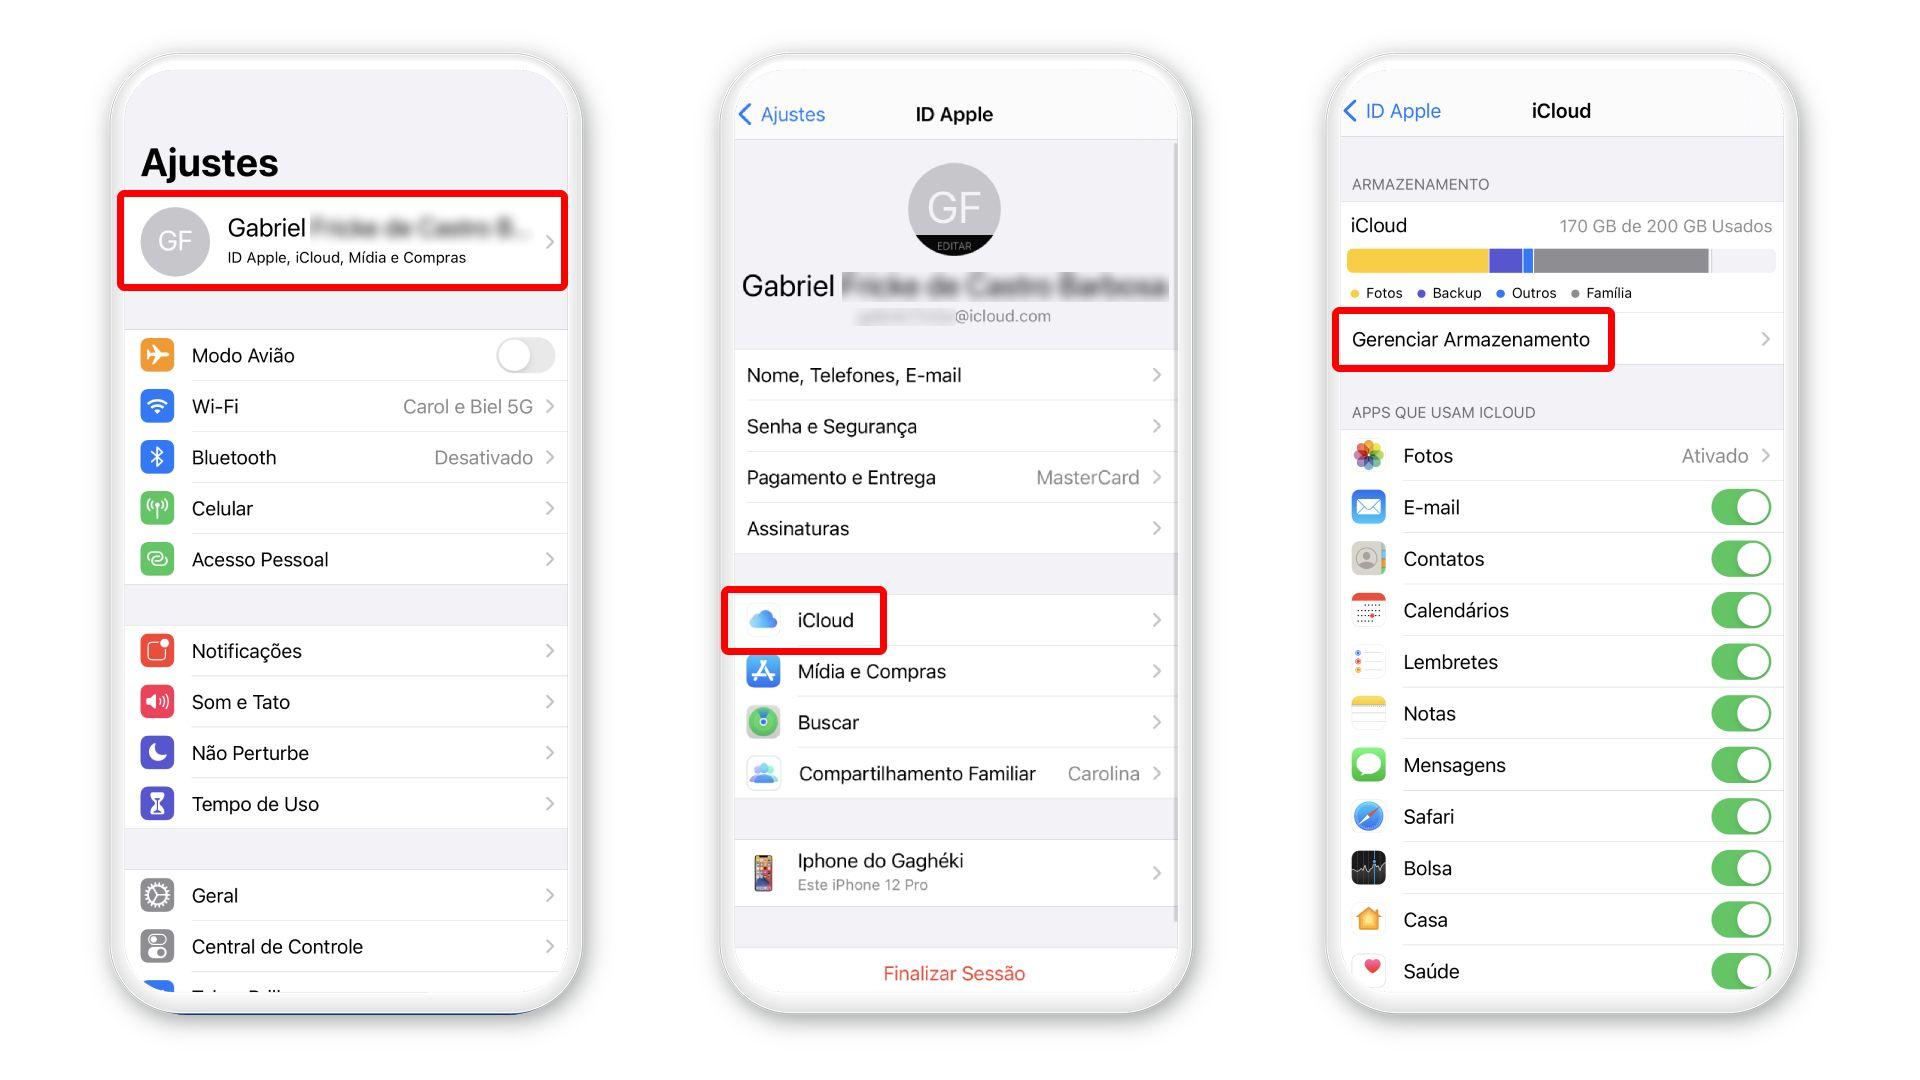 Como apagar fotos do iCloud: acesse o recurso de gerenciar armazenamento no iPhone (Foto: Arte/Zoom)